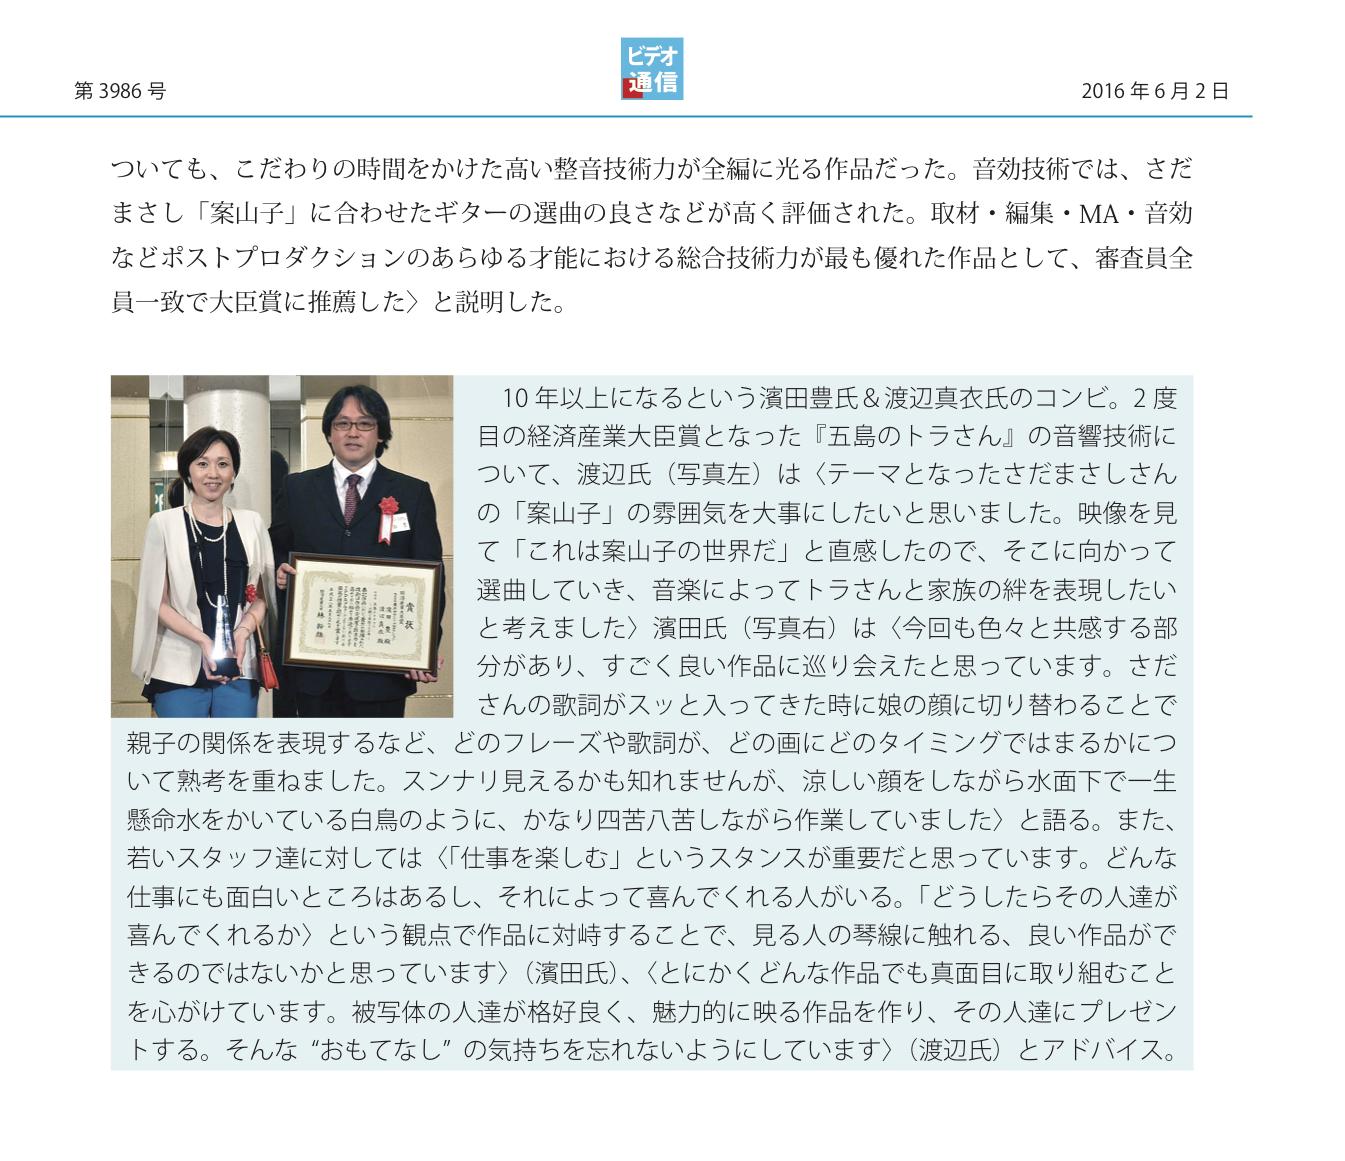 JPPAAWARD2016記事5